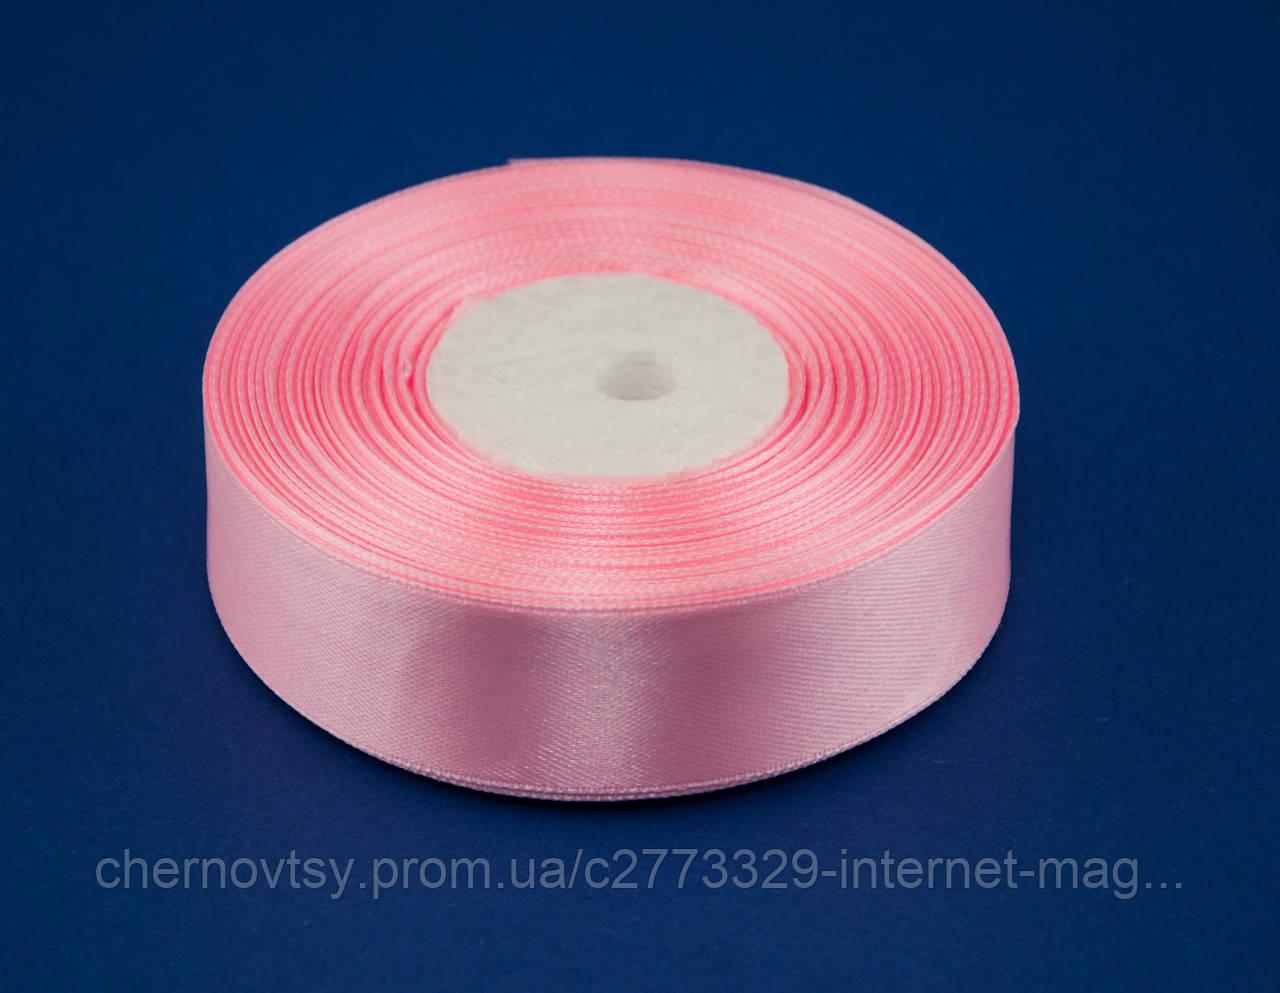 Лента атлас 2 см, 33 м, № 04 нежно розовая